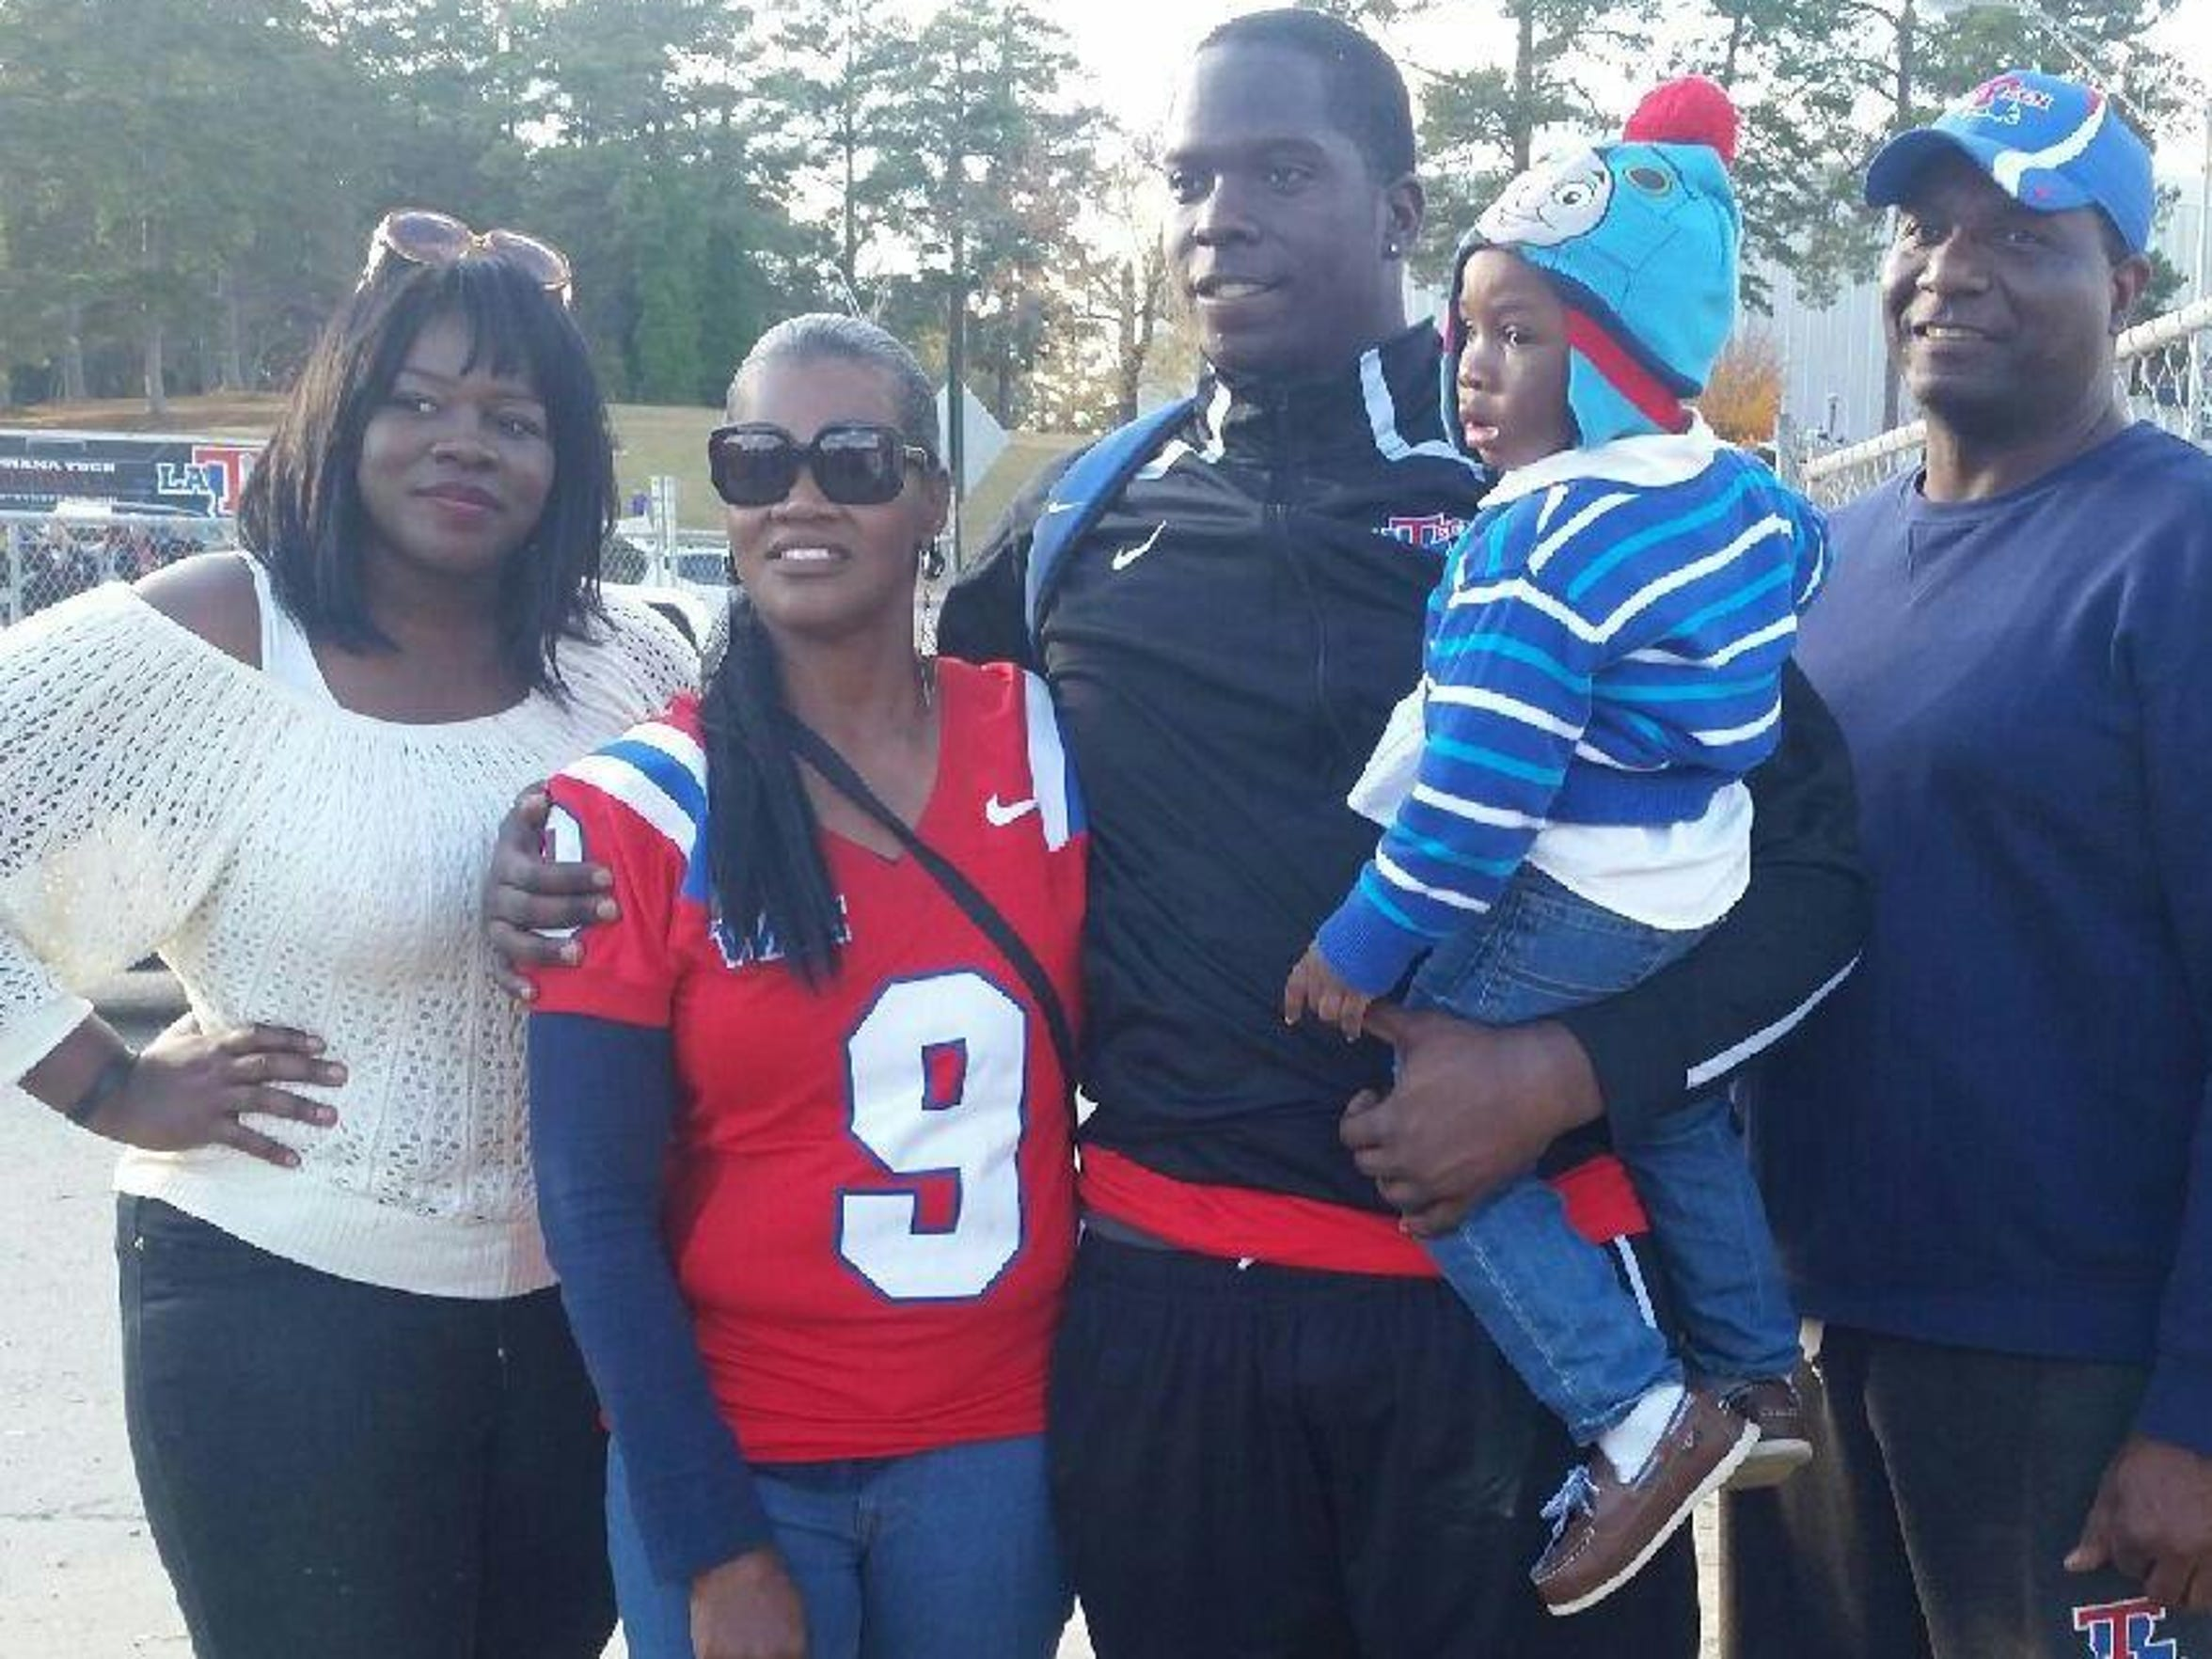 Vernon Butler, center, poses for a photo with his family